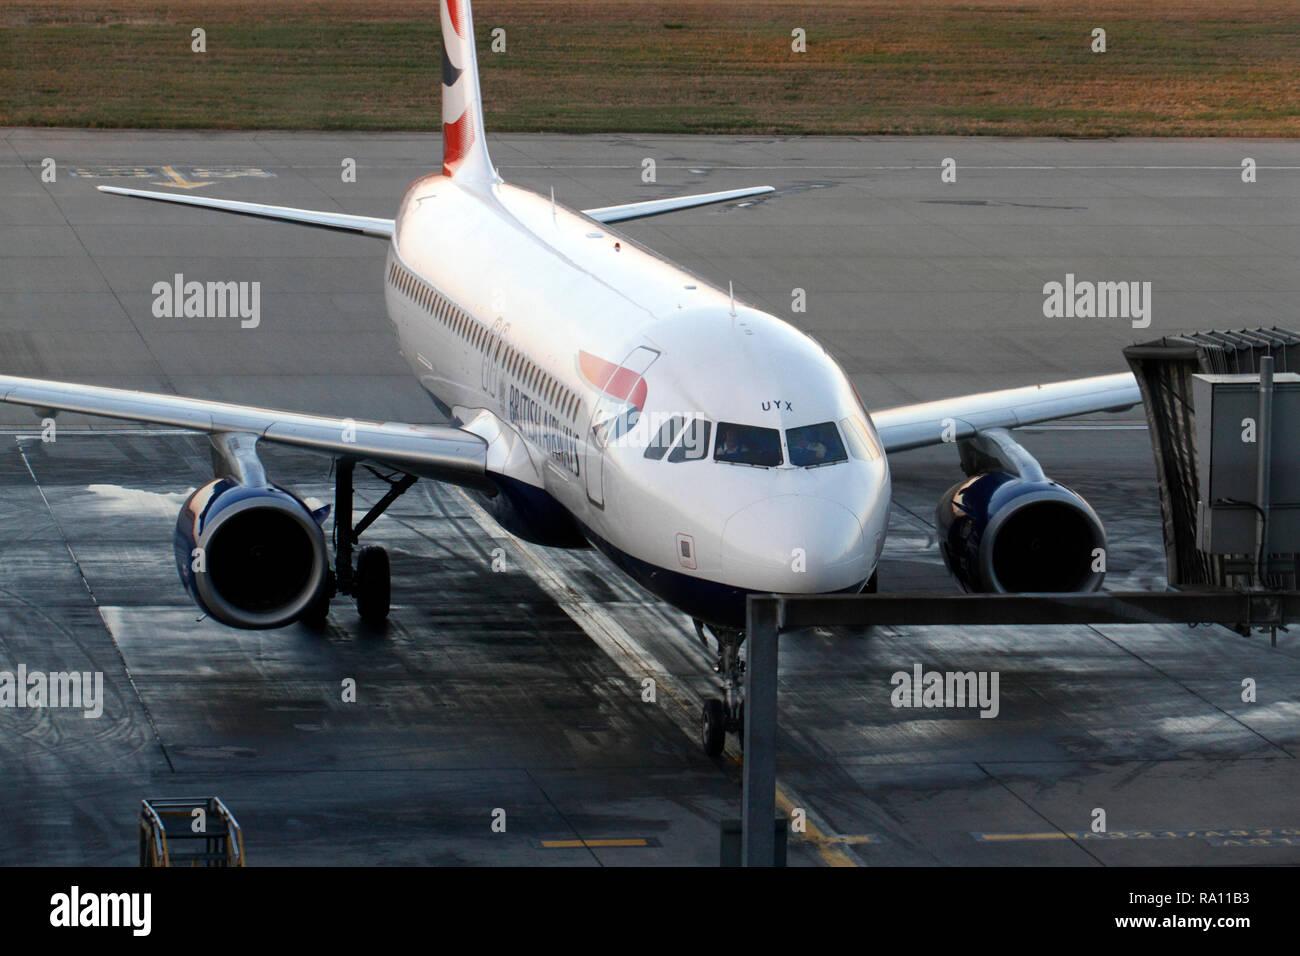 BA arrival. at the gate, Heathrow airport. London UK. Terminal 5, BA. - Stock Image